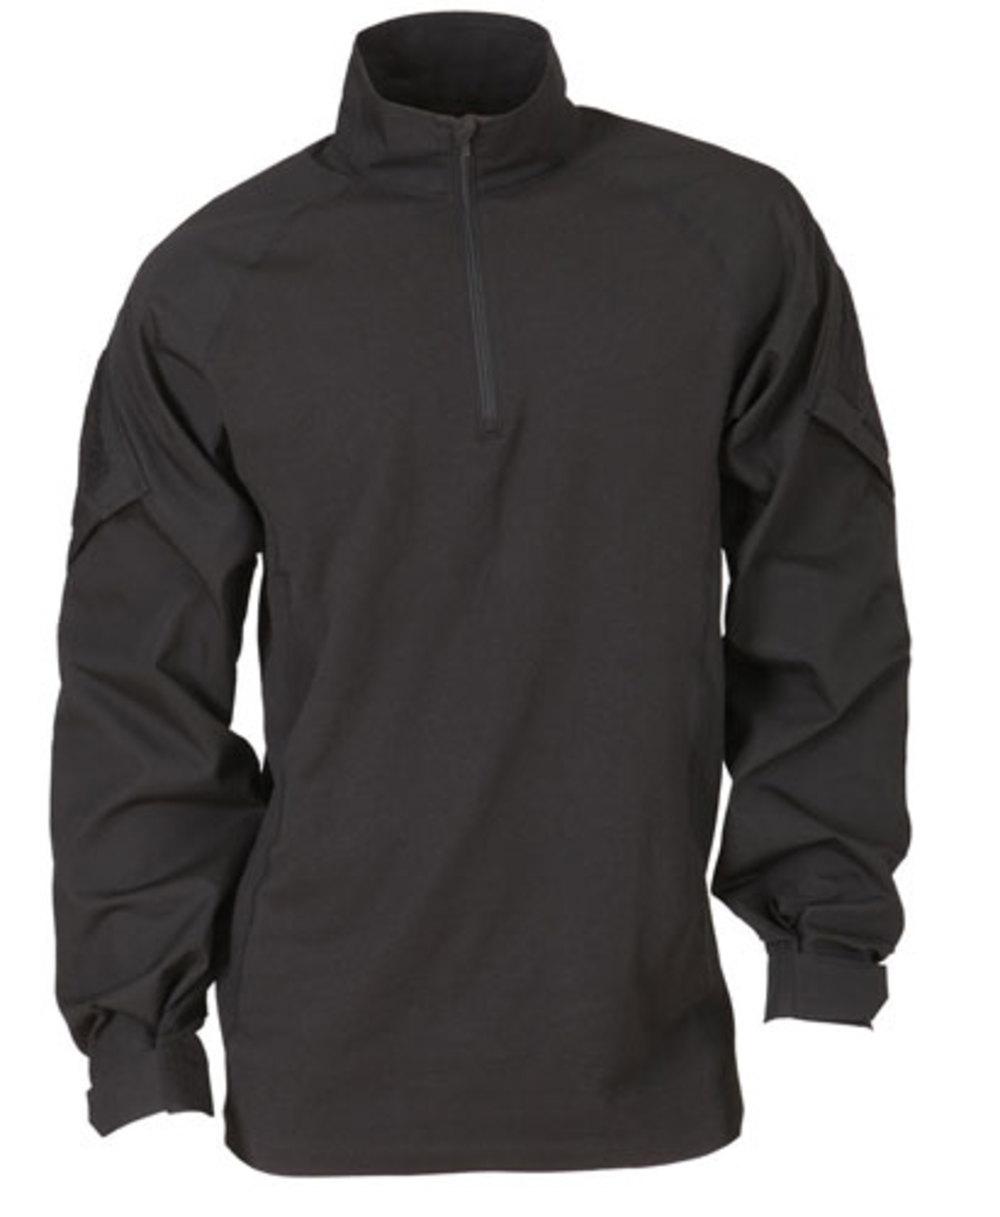 Rapid Assault Shirt, Black by 5.11 Tactical